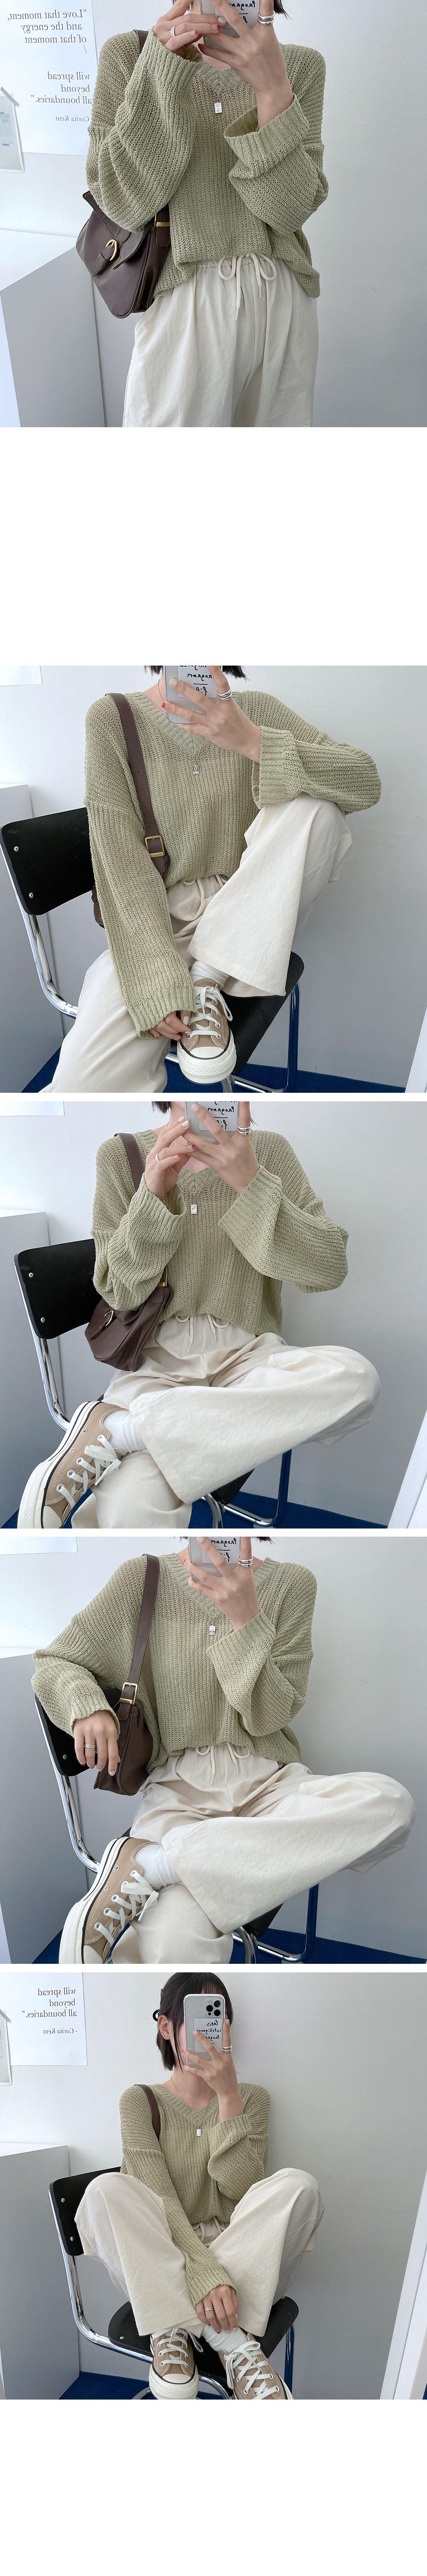 Chewing Booklet Side Split V-Neck Knitwear